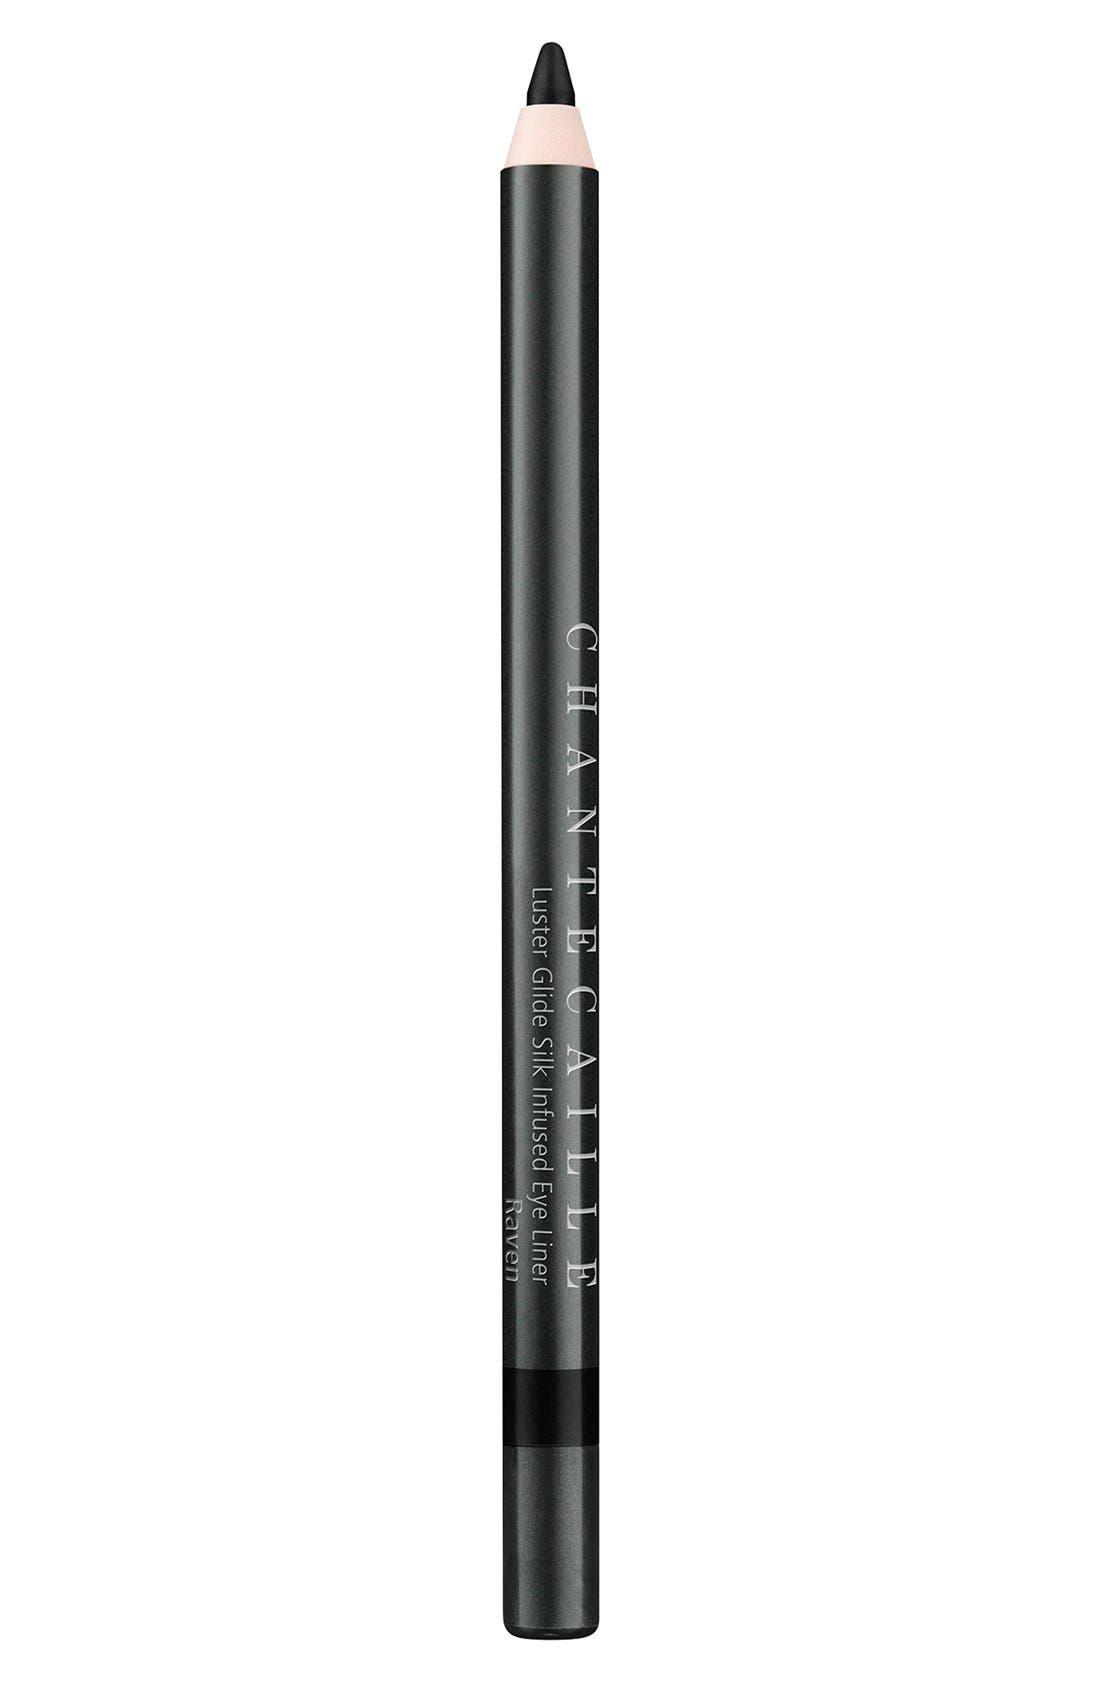 Luster Glide Silk Infused Eyeliner,                             Main thumbnail 1, color,                             RAVEN